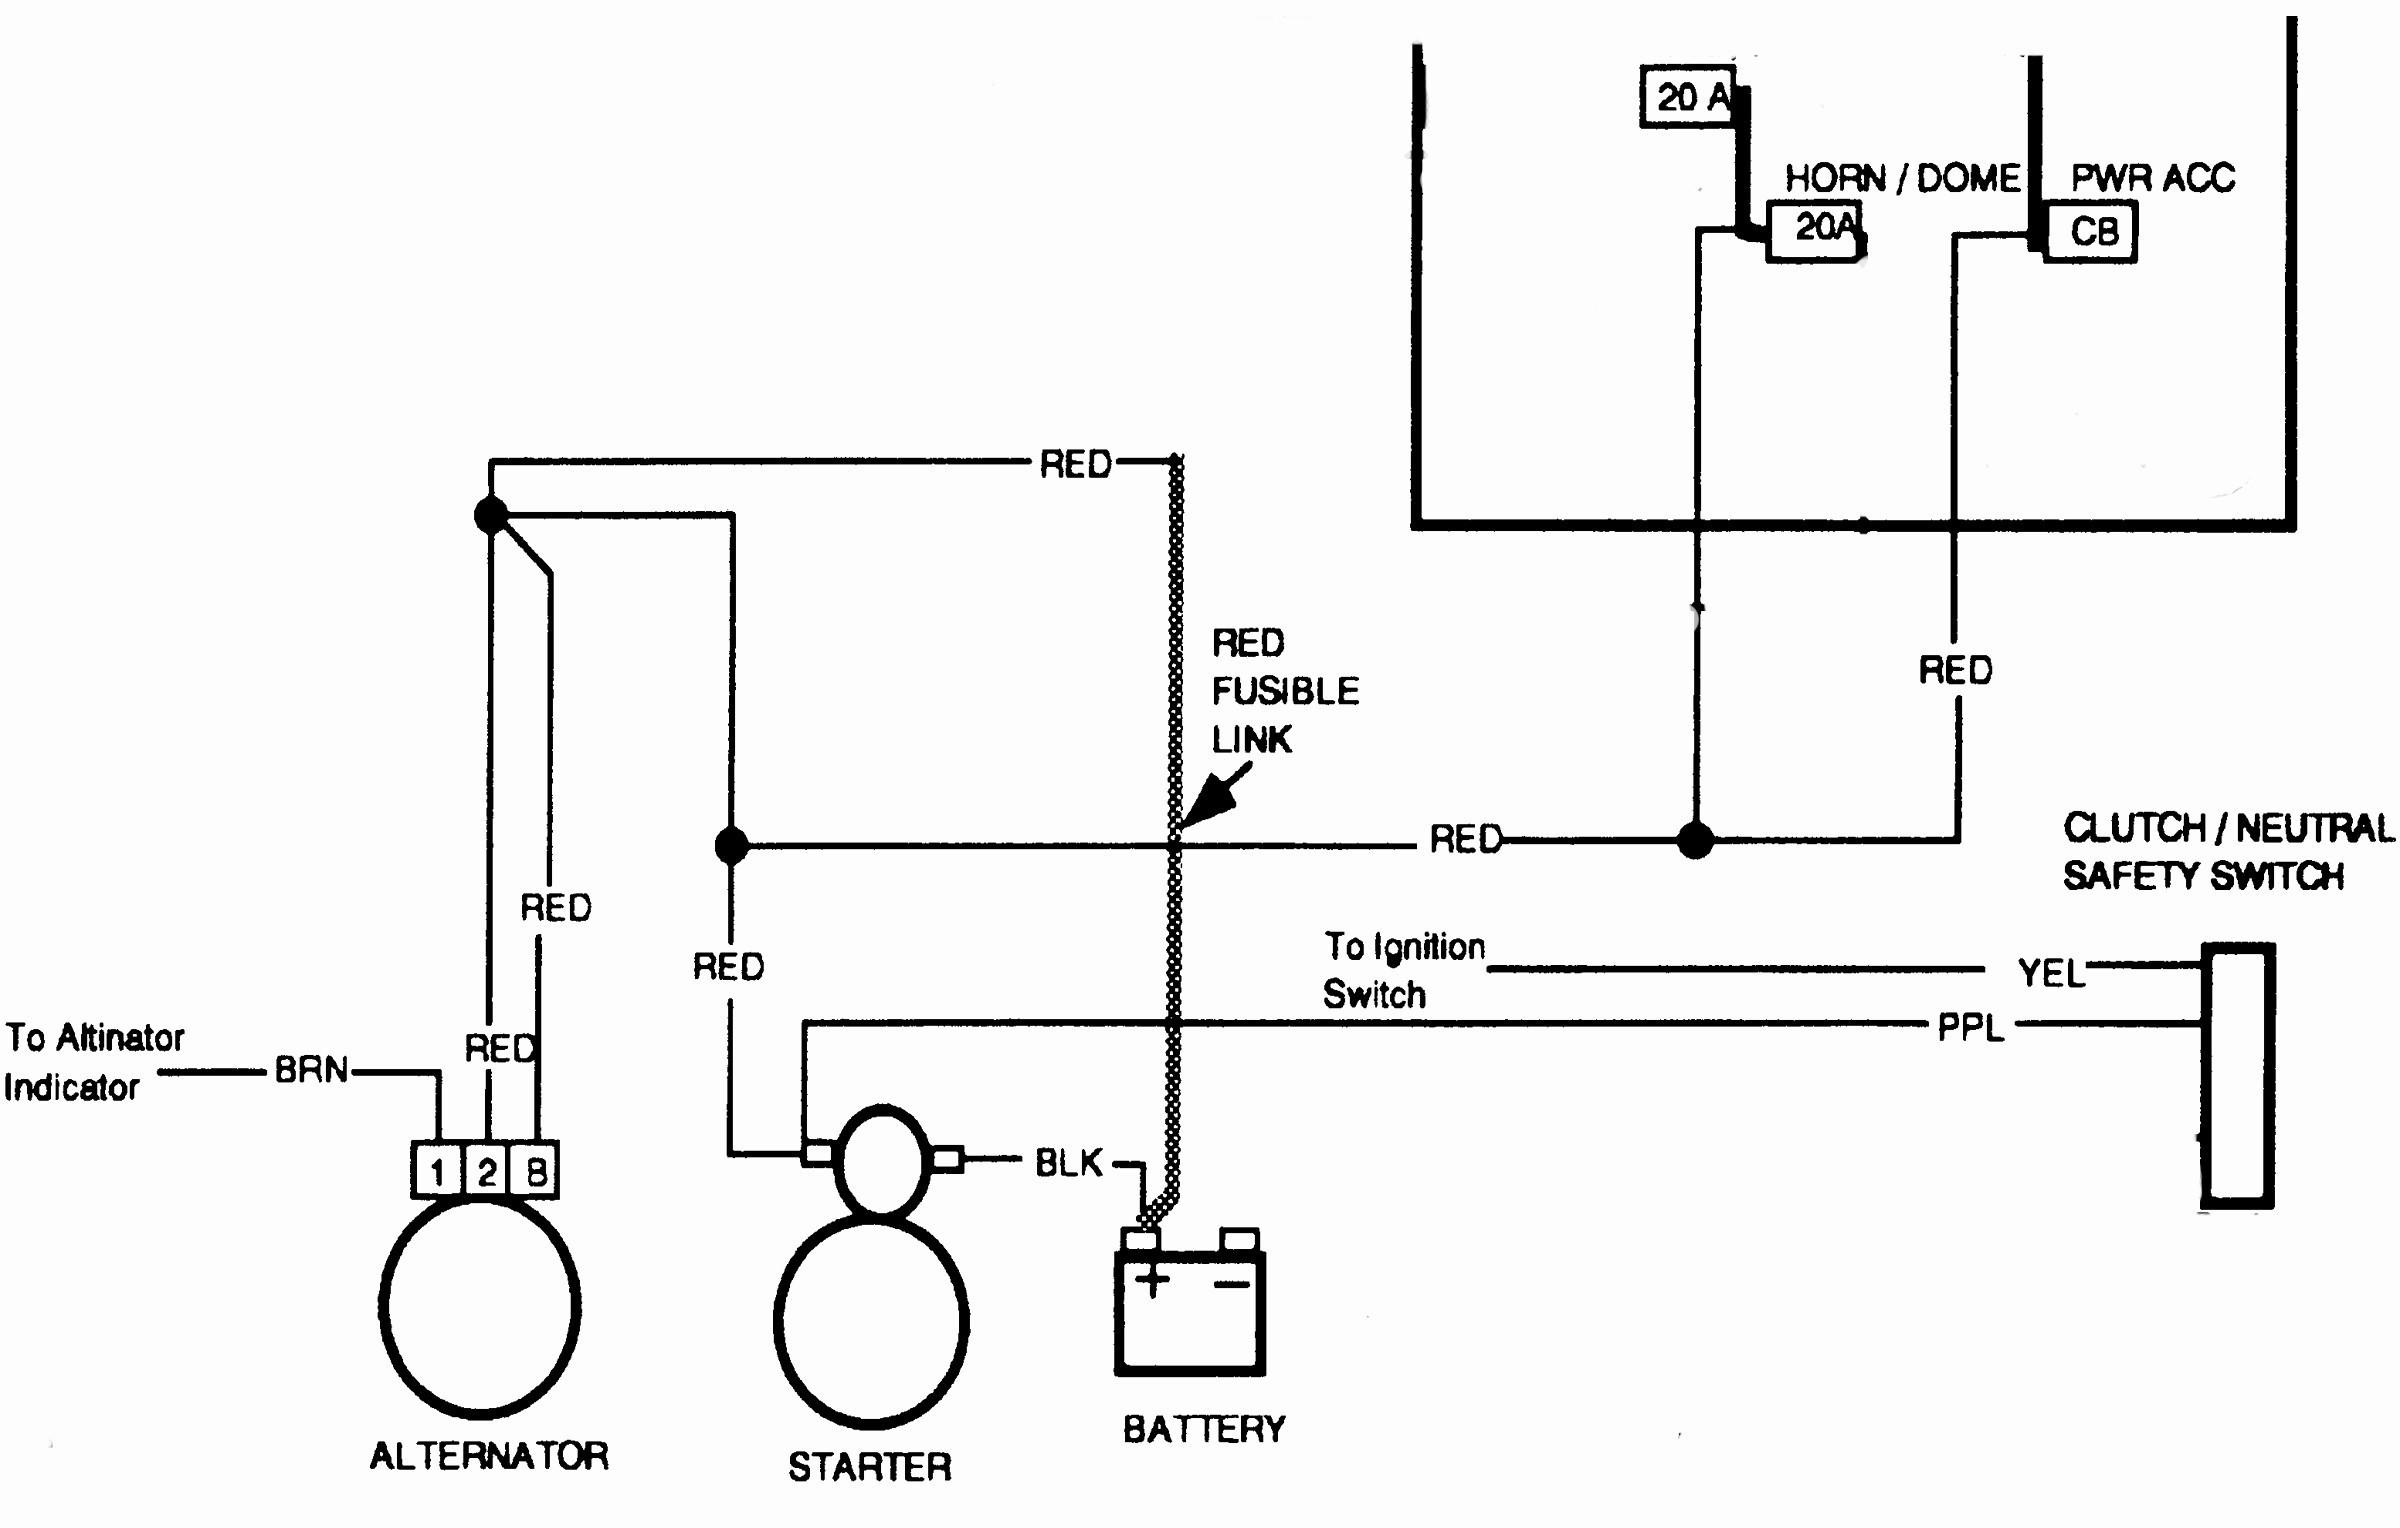 1997 Chevy Astro Van Alternator Wiring Diagram 66 Ford Mustang Alternator Wiring Diagram Source Auto5 Yenpancane Jeanjaures37 Fr